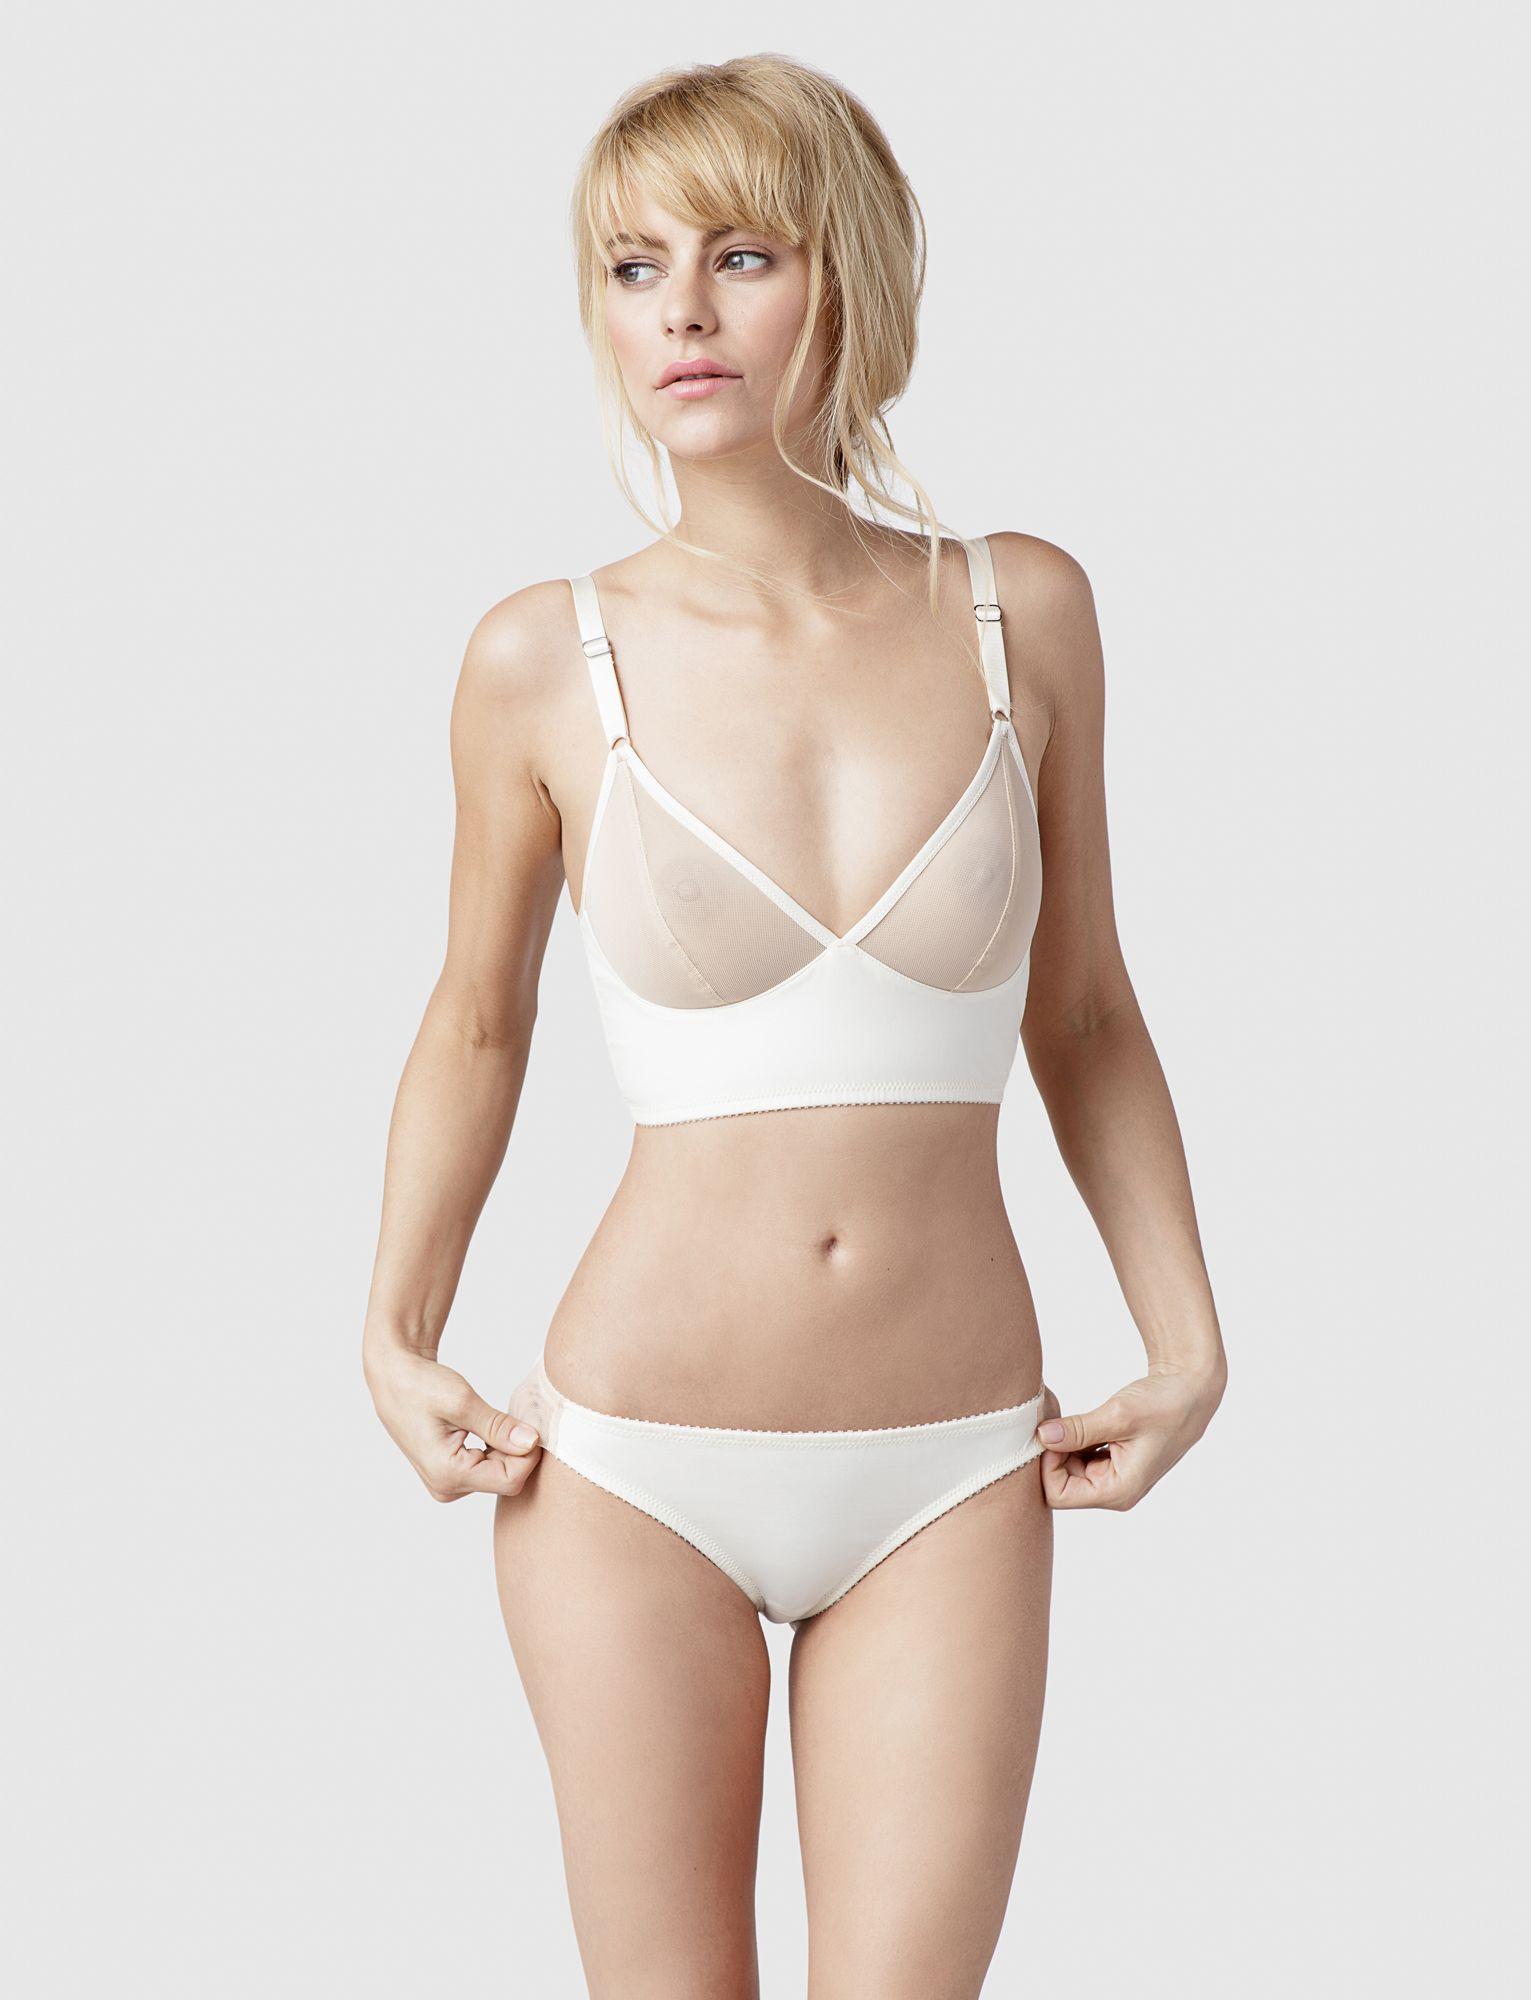 7fa4dce14d79e Luna Longline & Seamless Bikini, Champagne & Ivory, Fortnight Lingerie,  #SS17